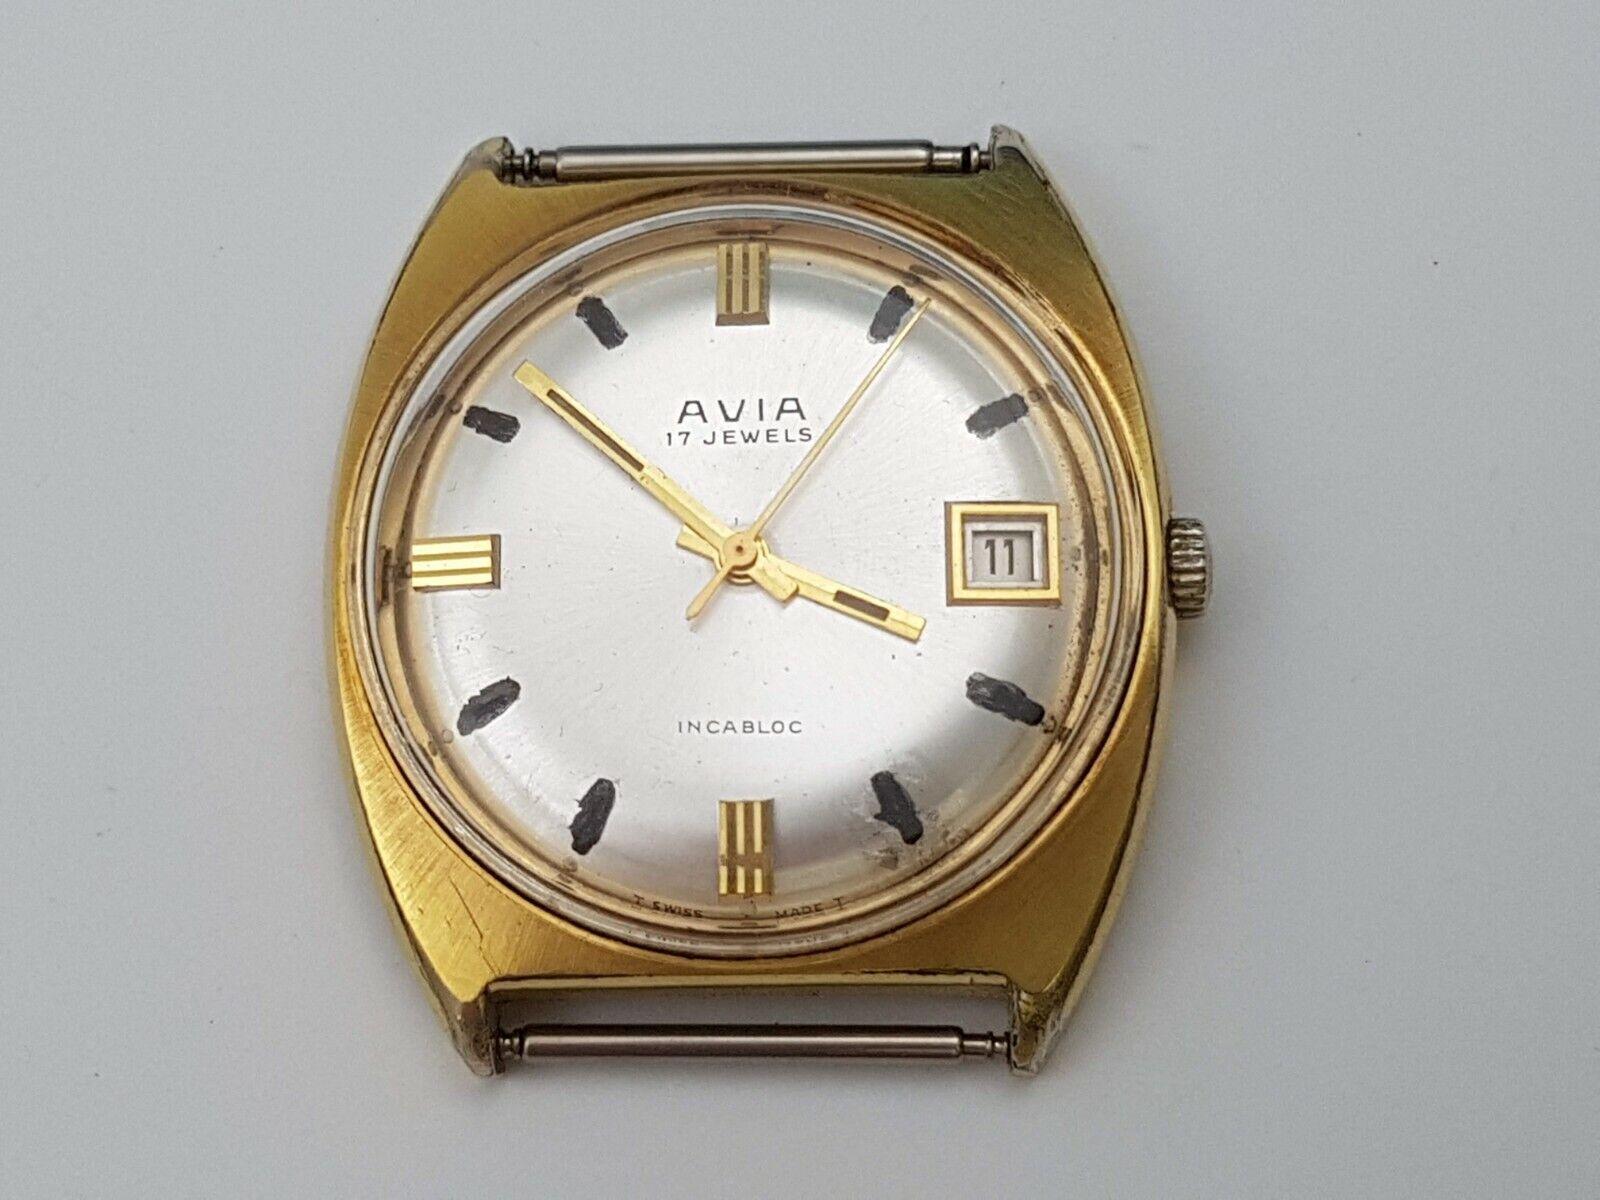 Image 1 - Vintage watch AVIA, Switzerland, mechanics, 17 stones, gilding.